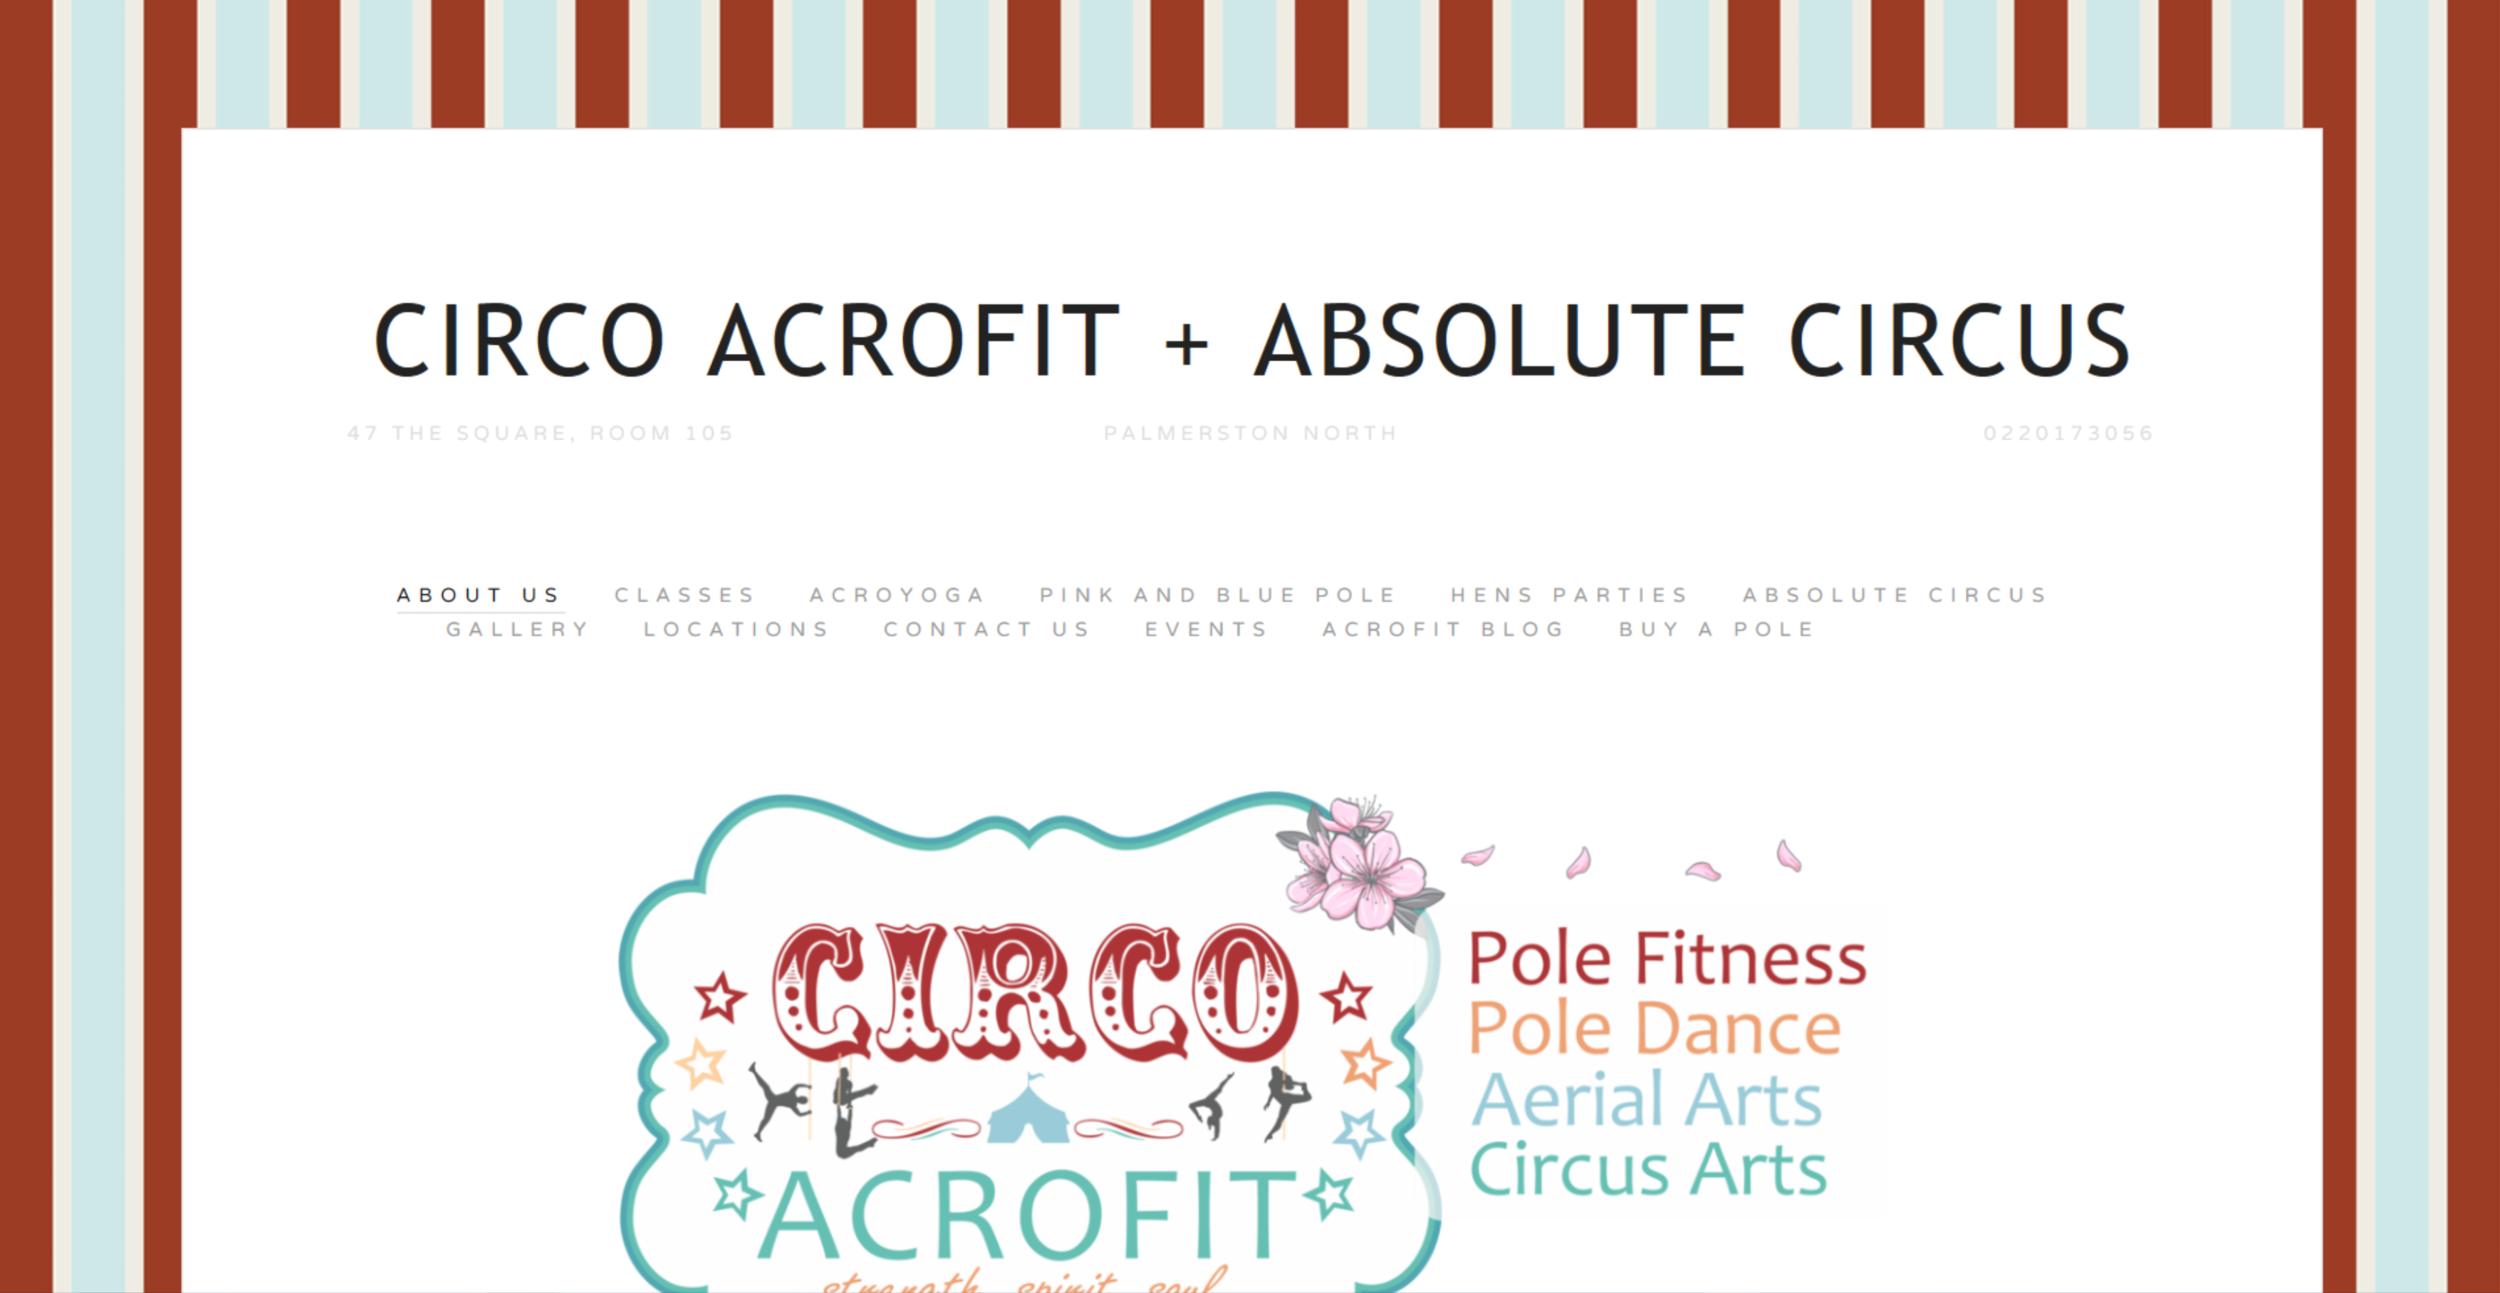 Circo Acrofit + Absolute Circus.png